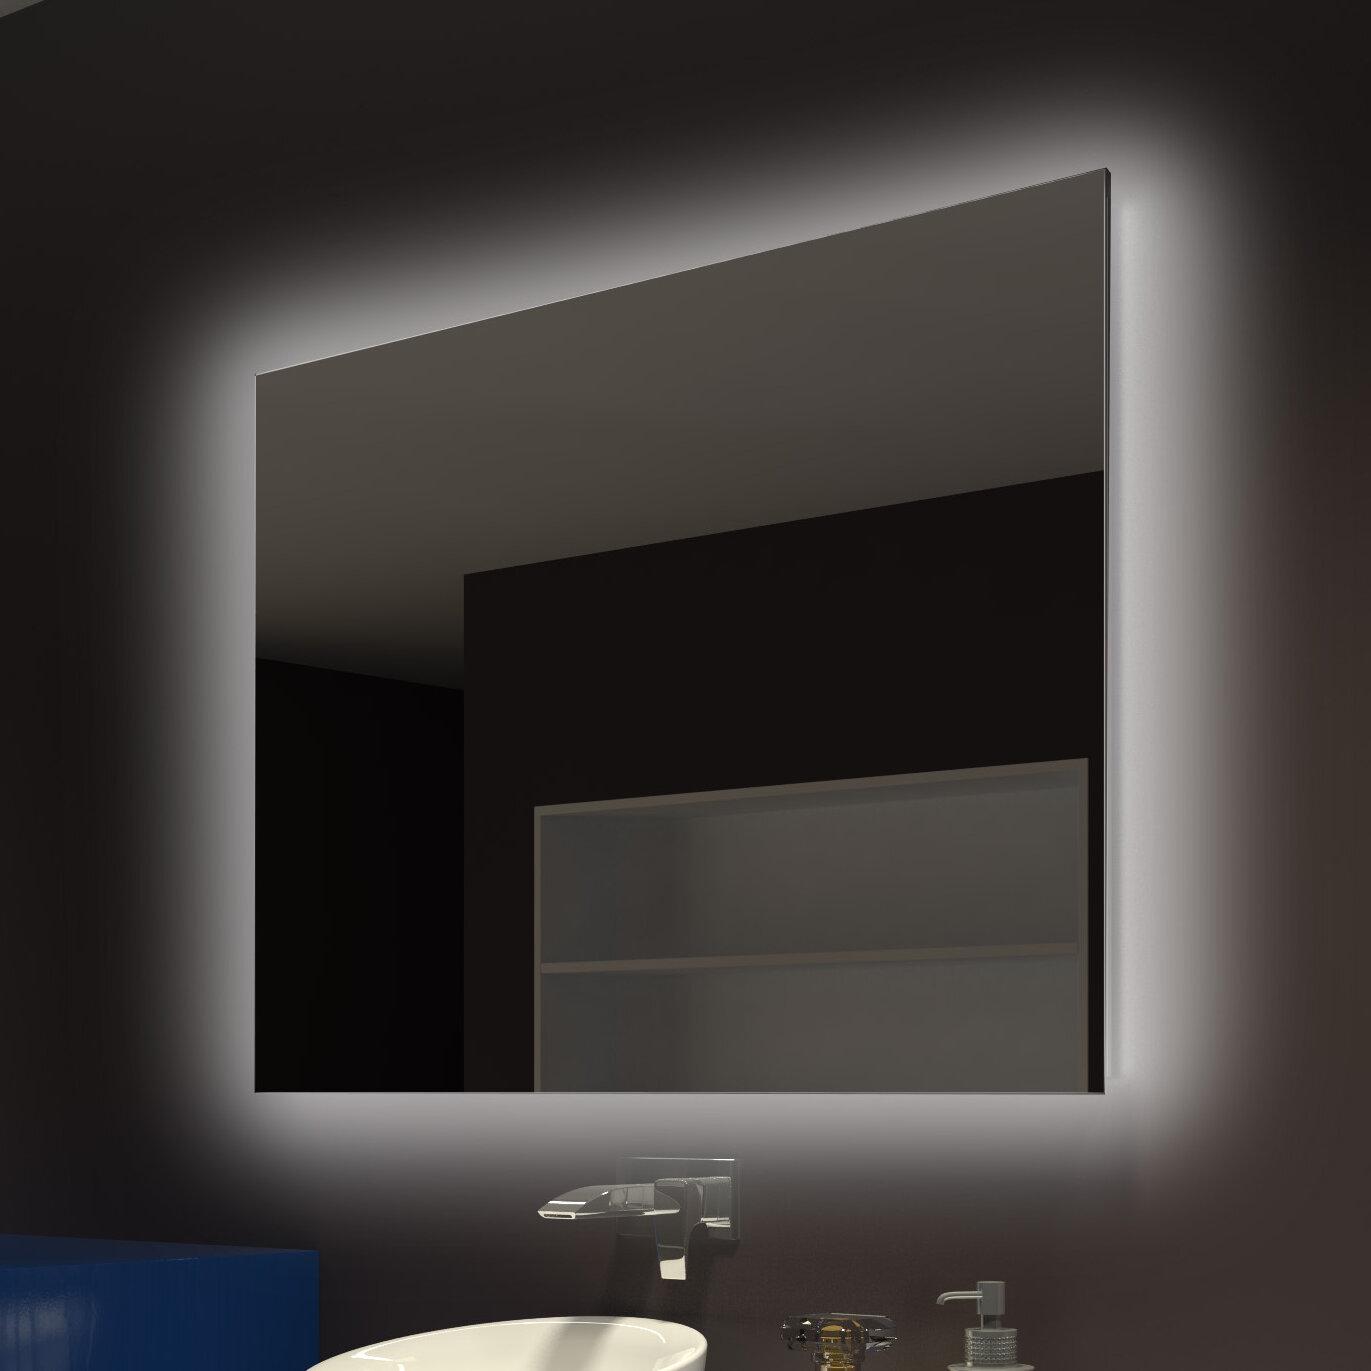 Everly quinn moumoune backlit bathroom vanity mirror reviews wayfair